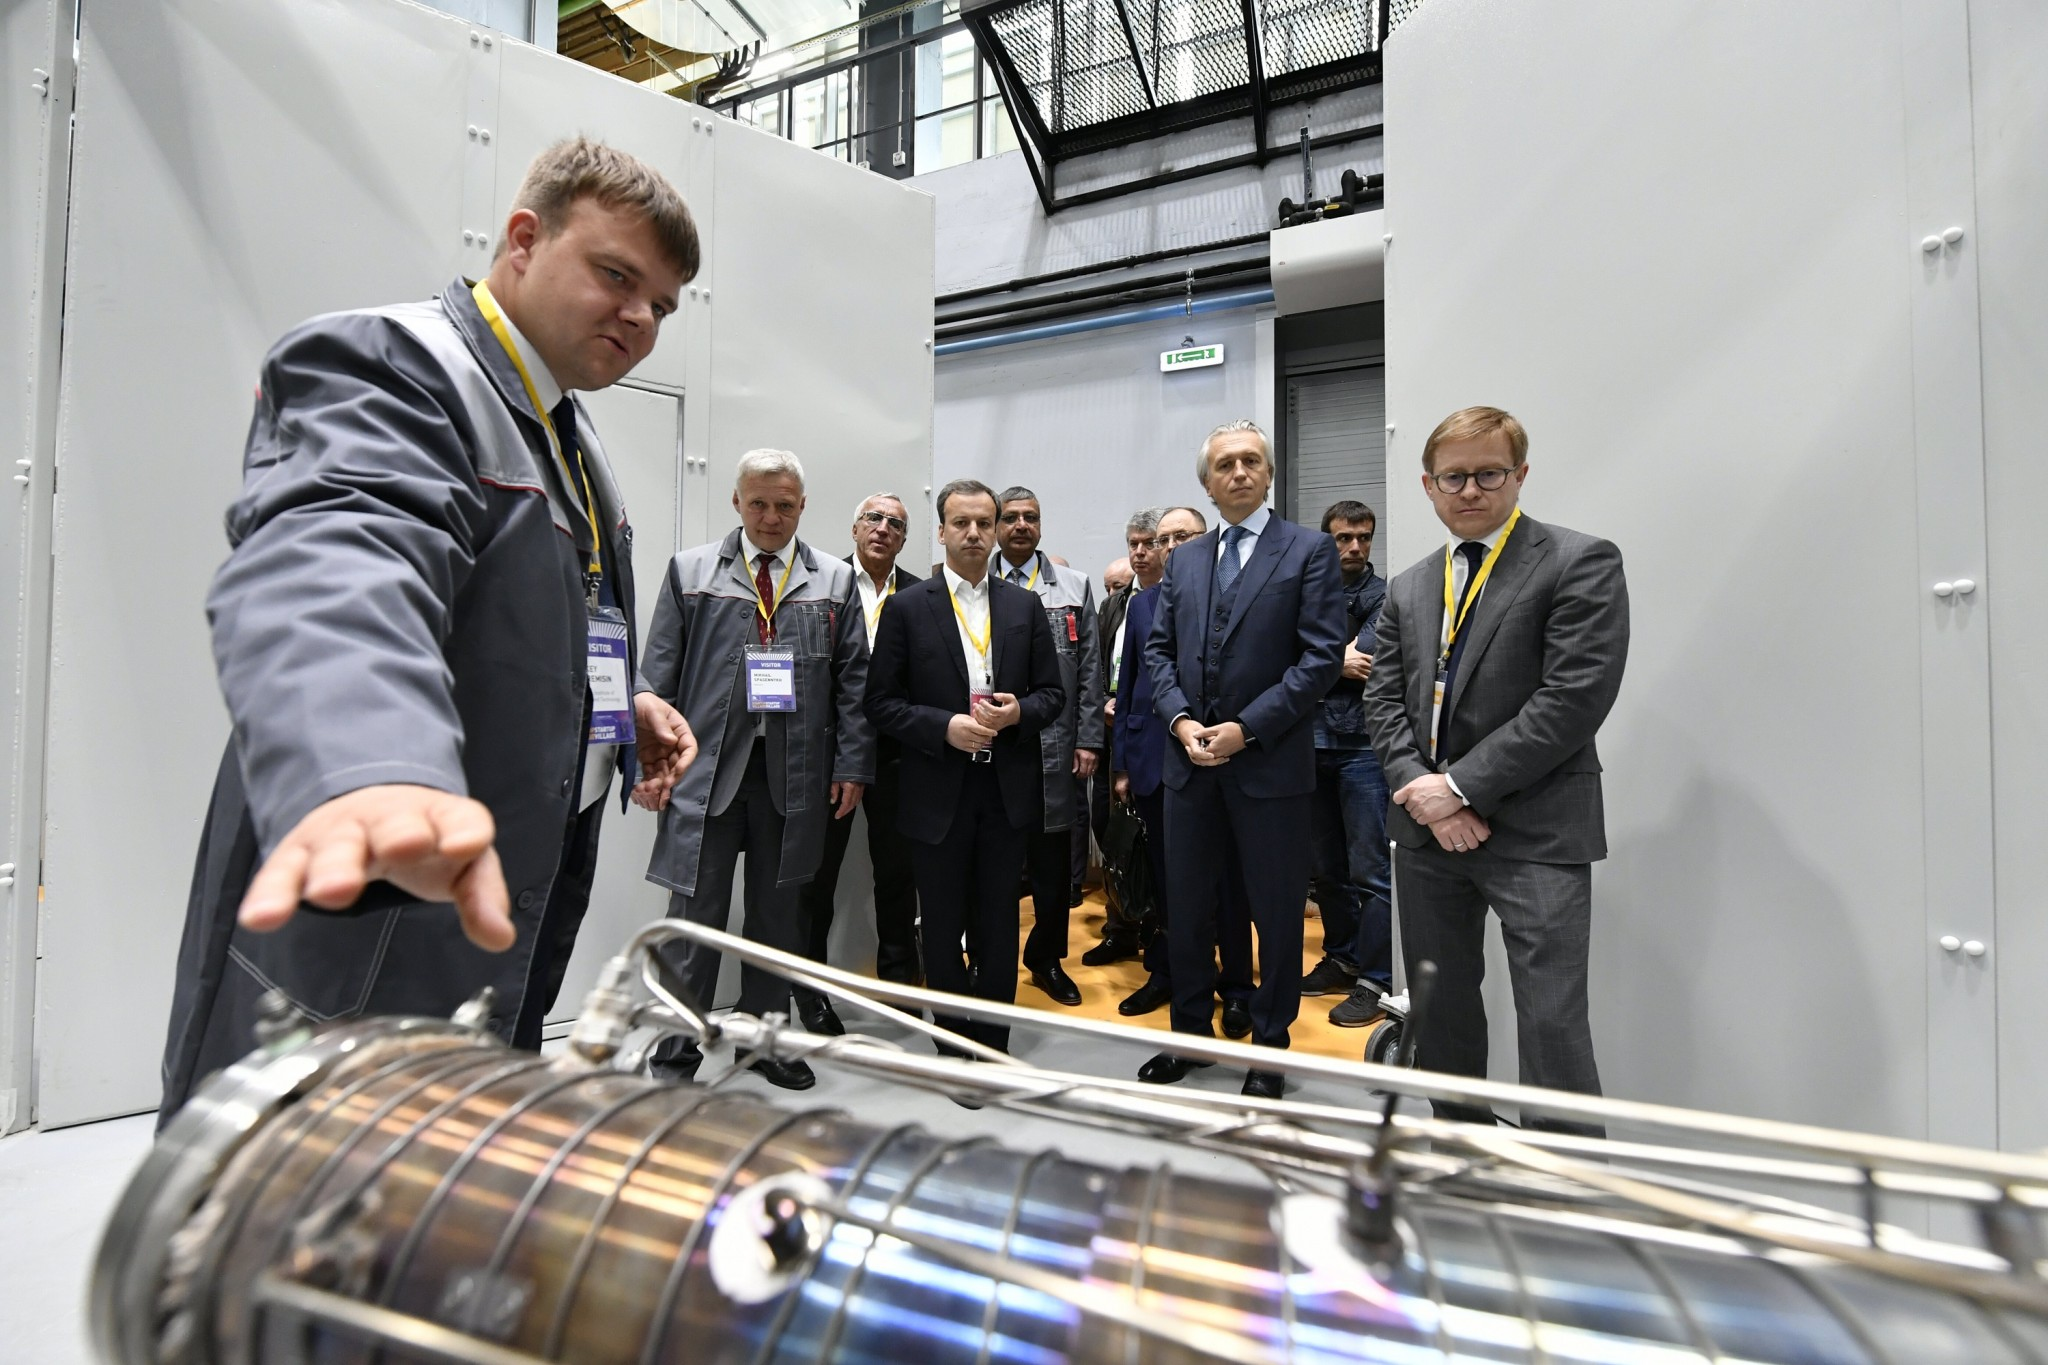 The leaders of Skolkovo, Skoltech and Gazprom Neft join Deputy Prime Minister Arkady Dvorkovich for a tour of Skoltech's new hydrocarbon recovery lab.